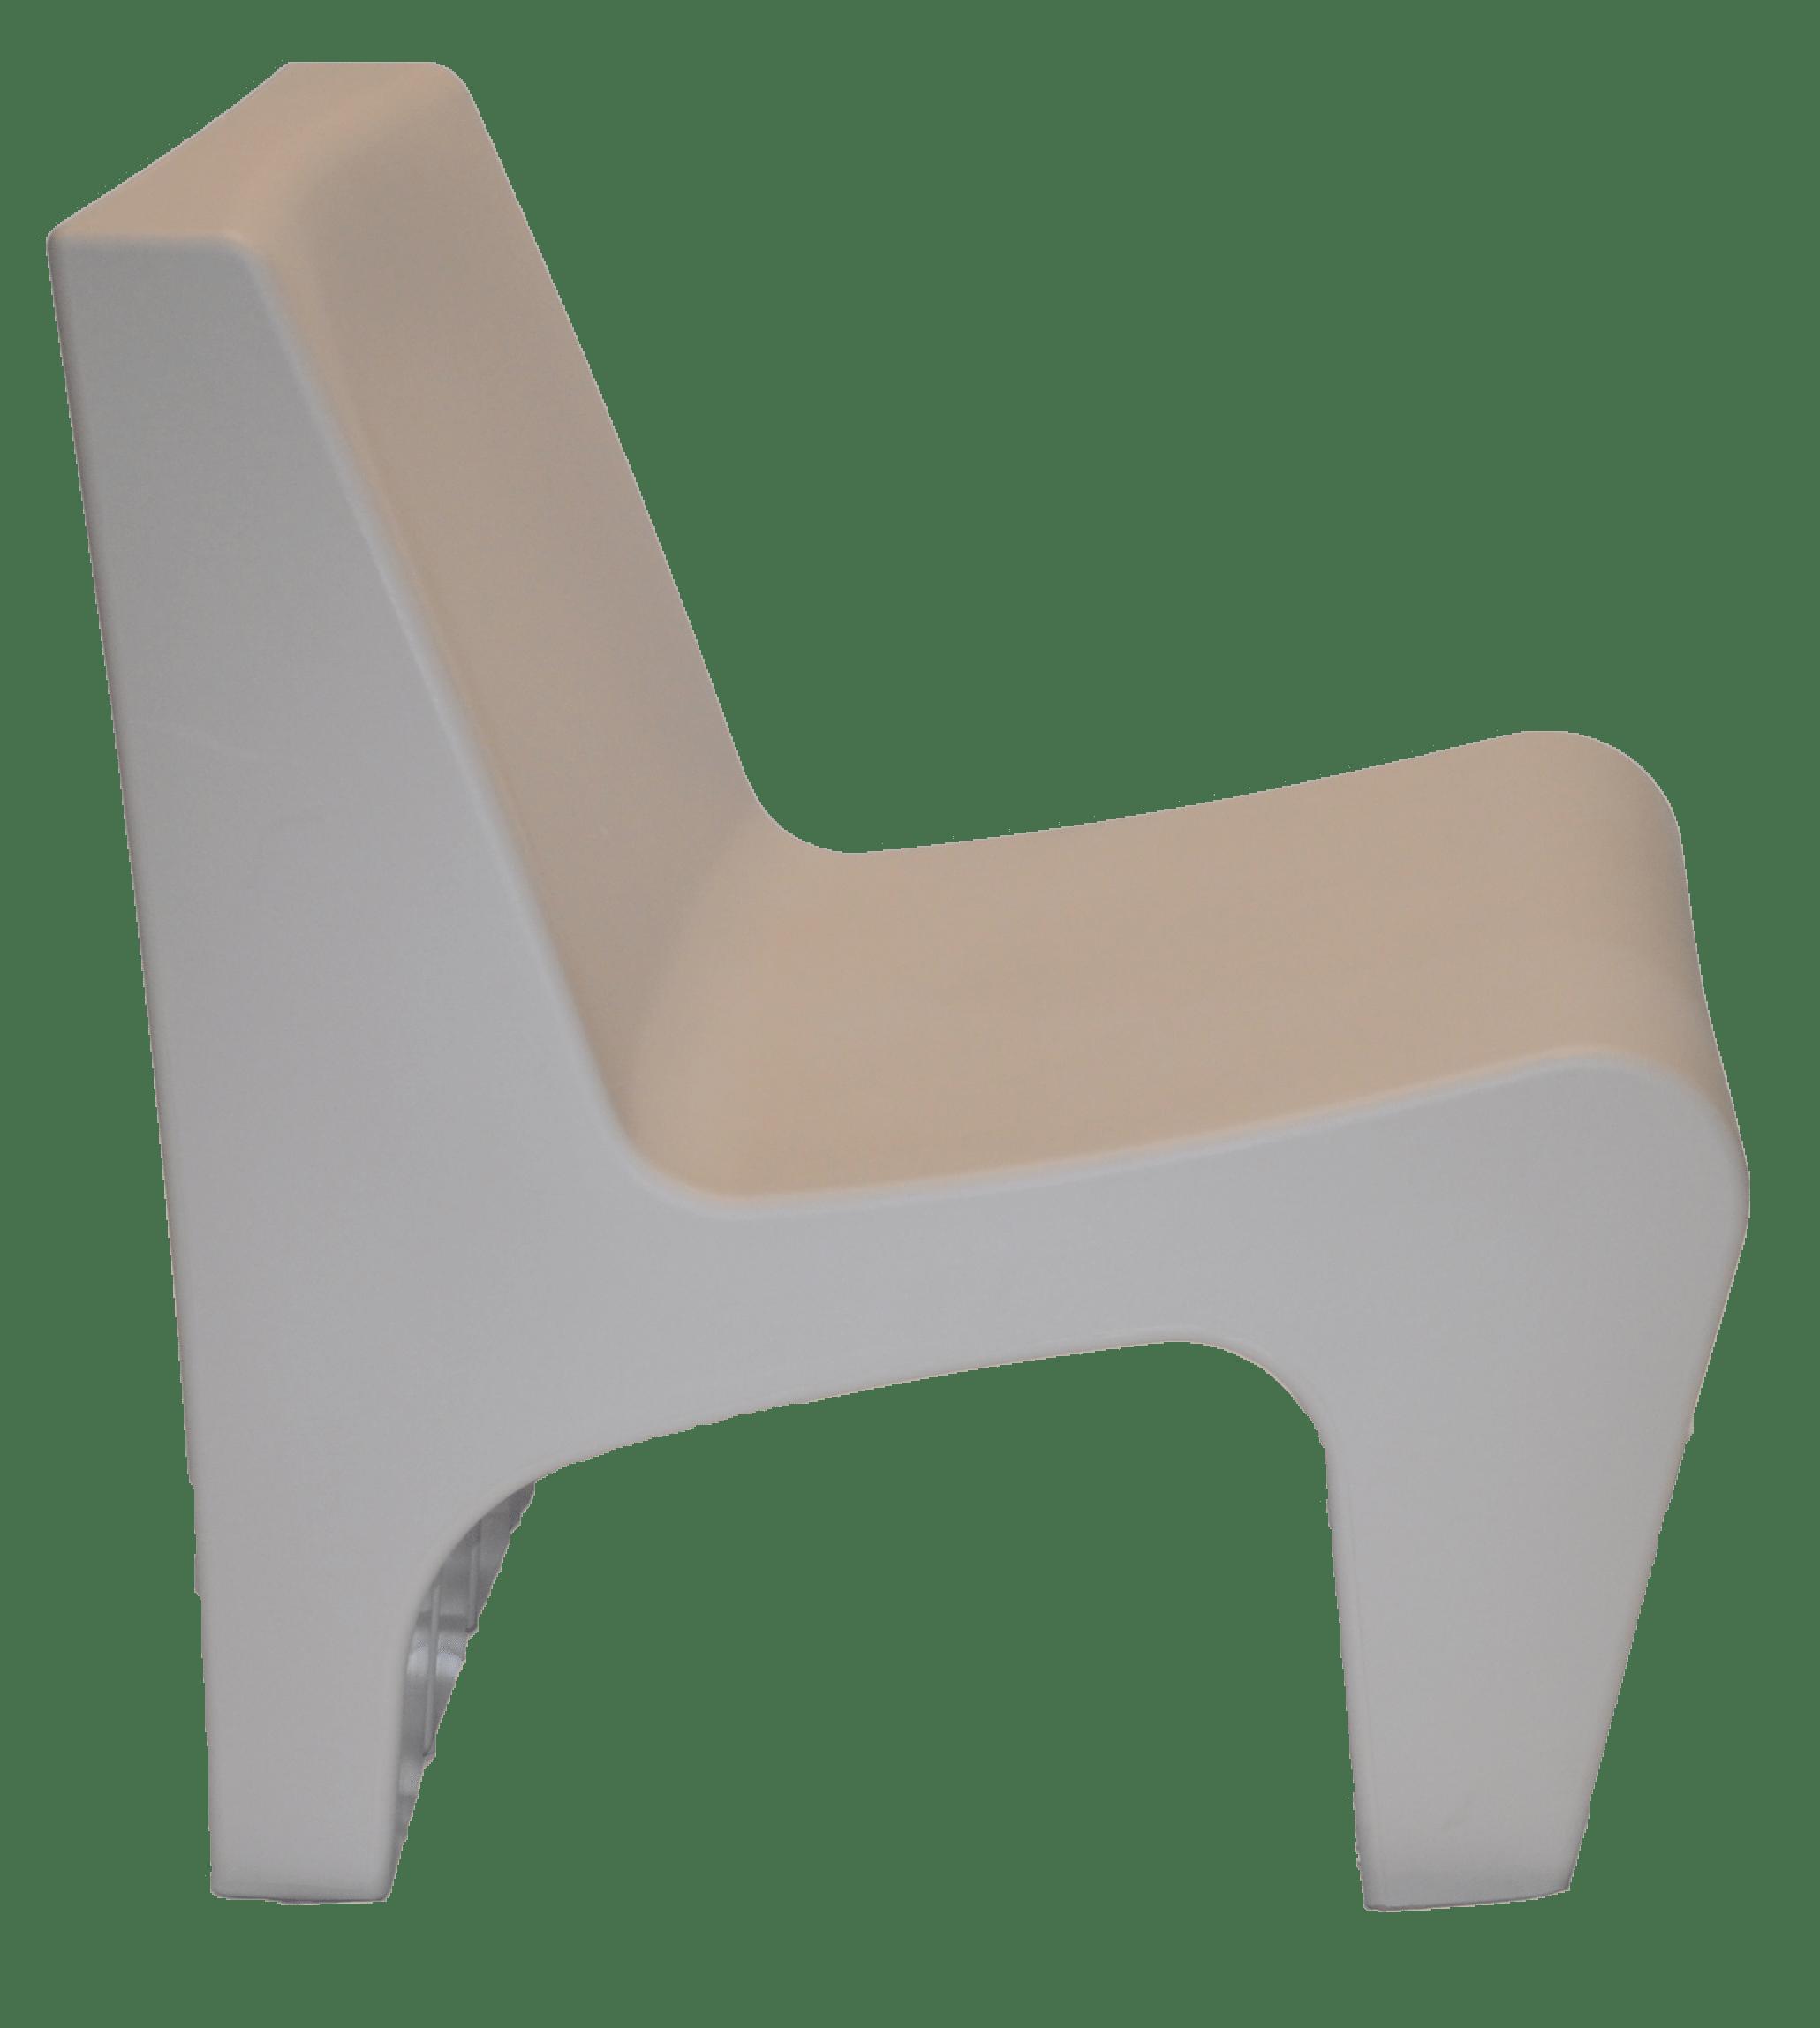 Poltrona Berta Concreto em Polietileno Tramontina 92711210